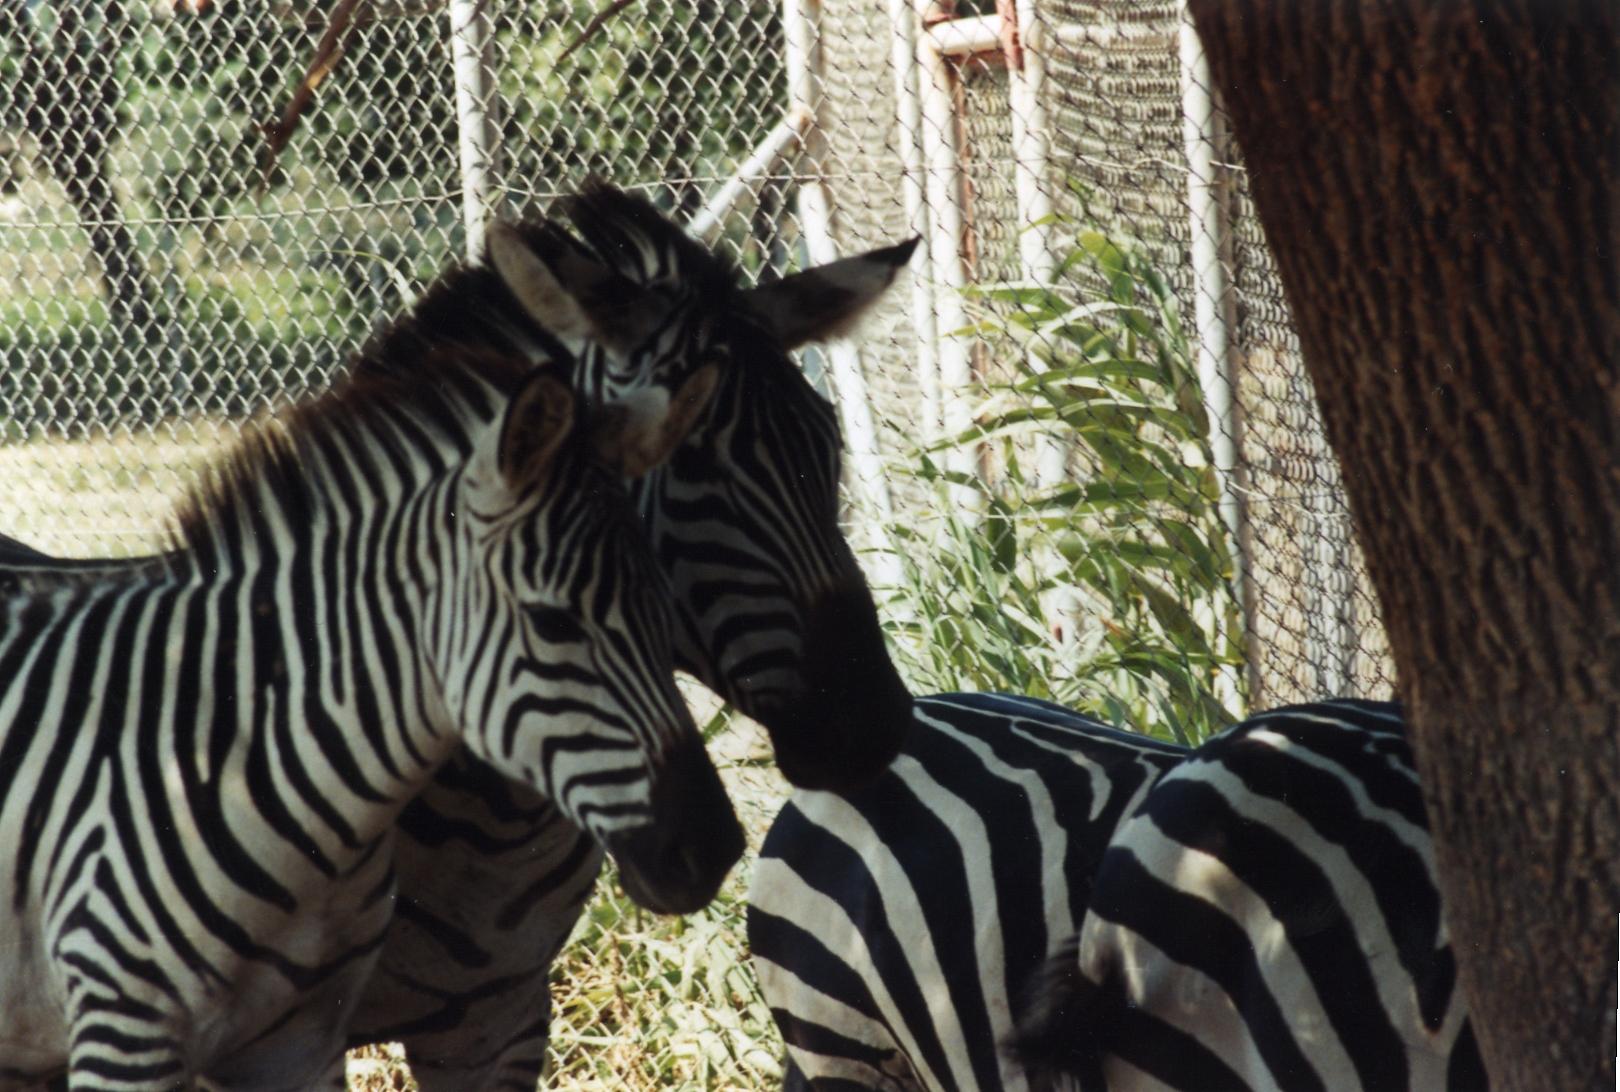 https://upload.wikimedia.org/wikipedia/commons/7/70/4_zebras%2C_r%C3%A9serve_africaine_de_Sigean.jpg